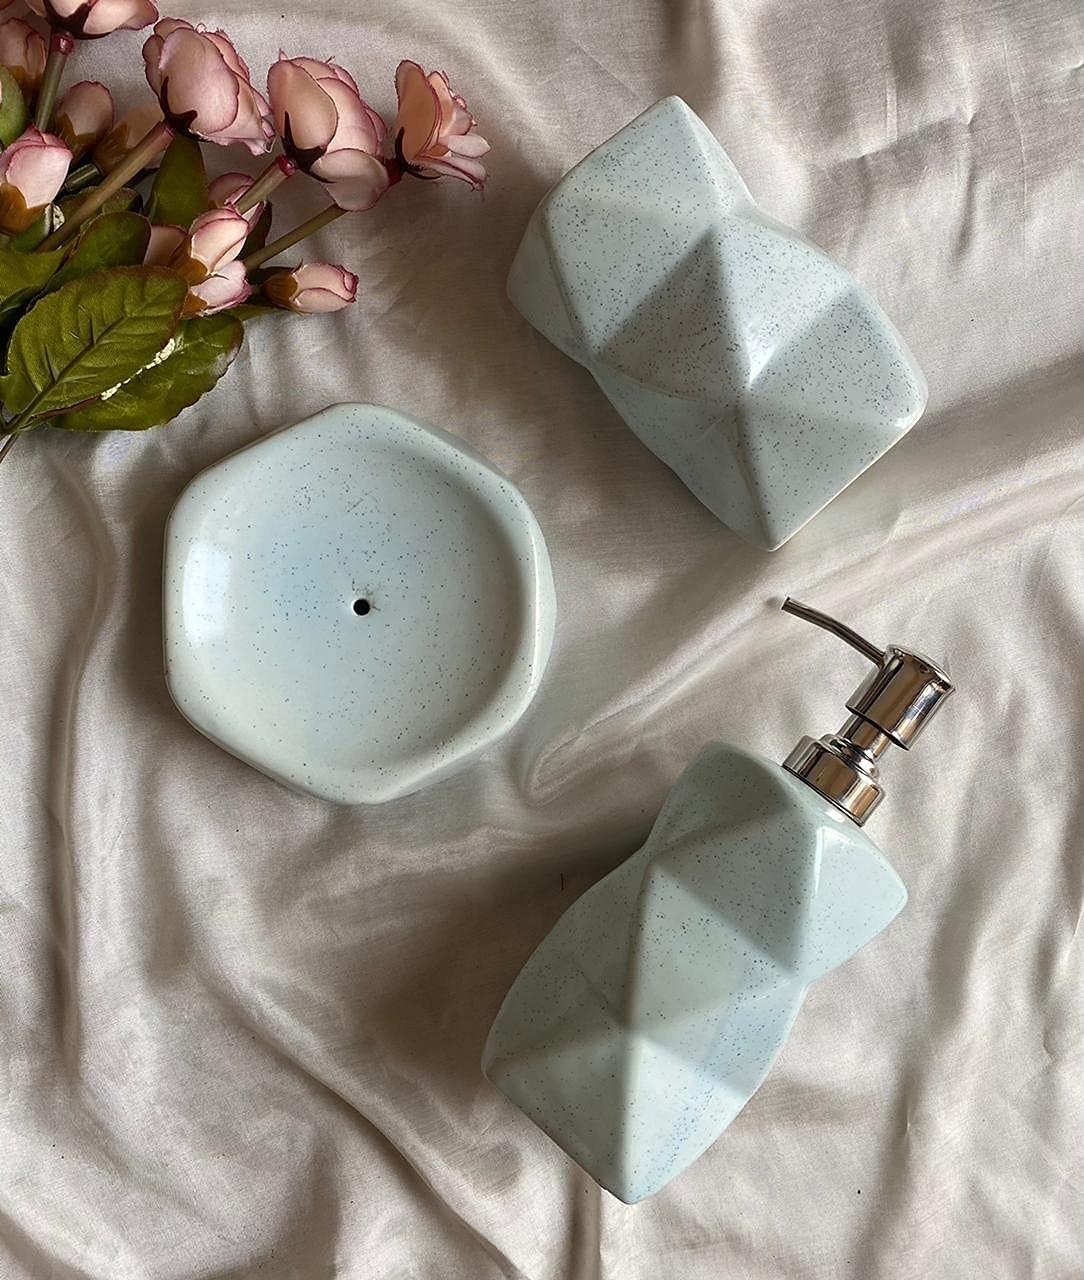 A light blue diamond shaped ceramic soap dispensing set